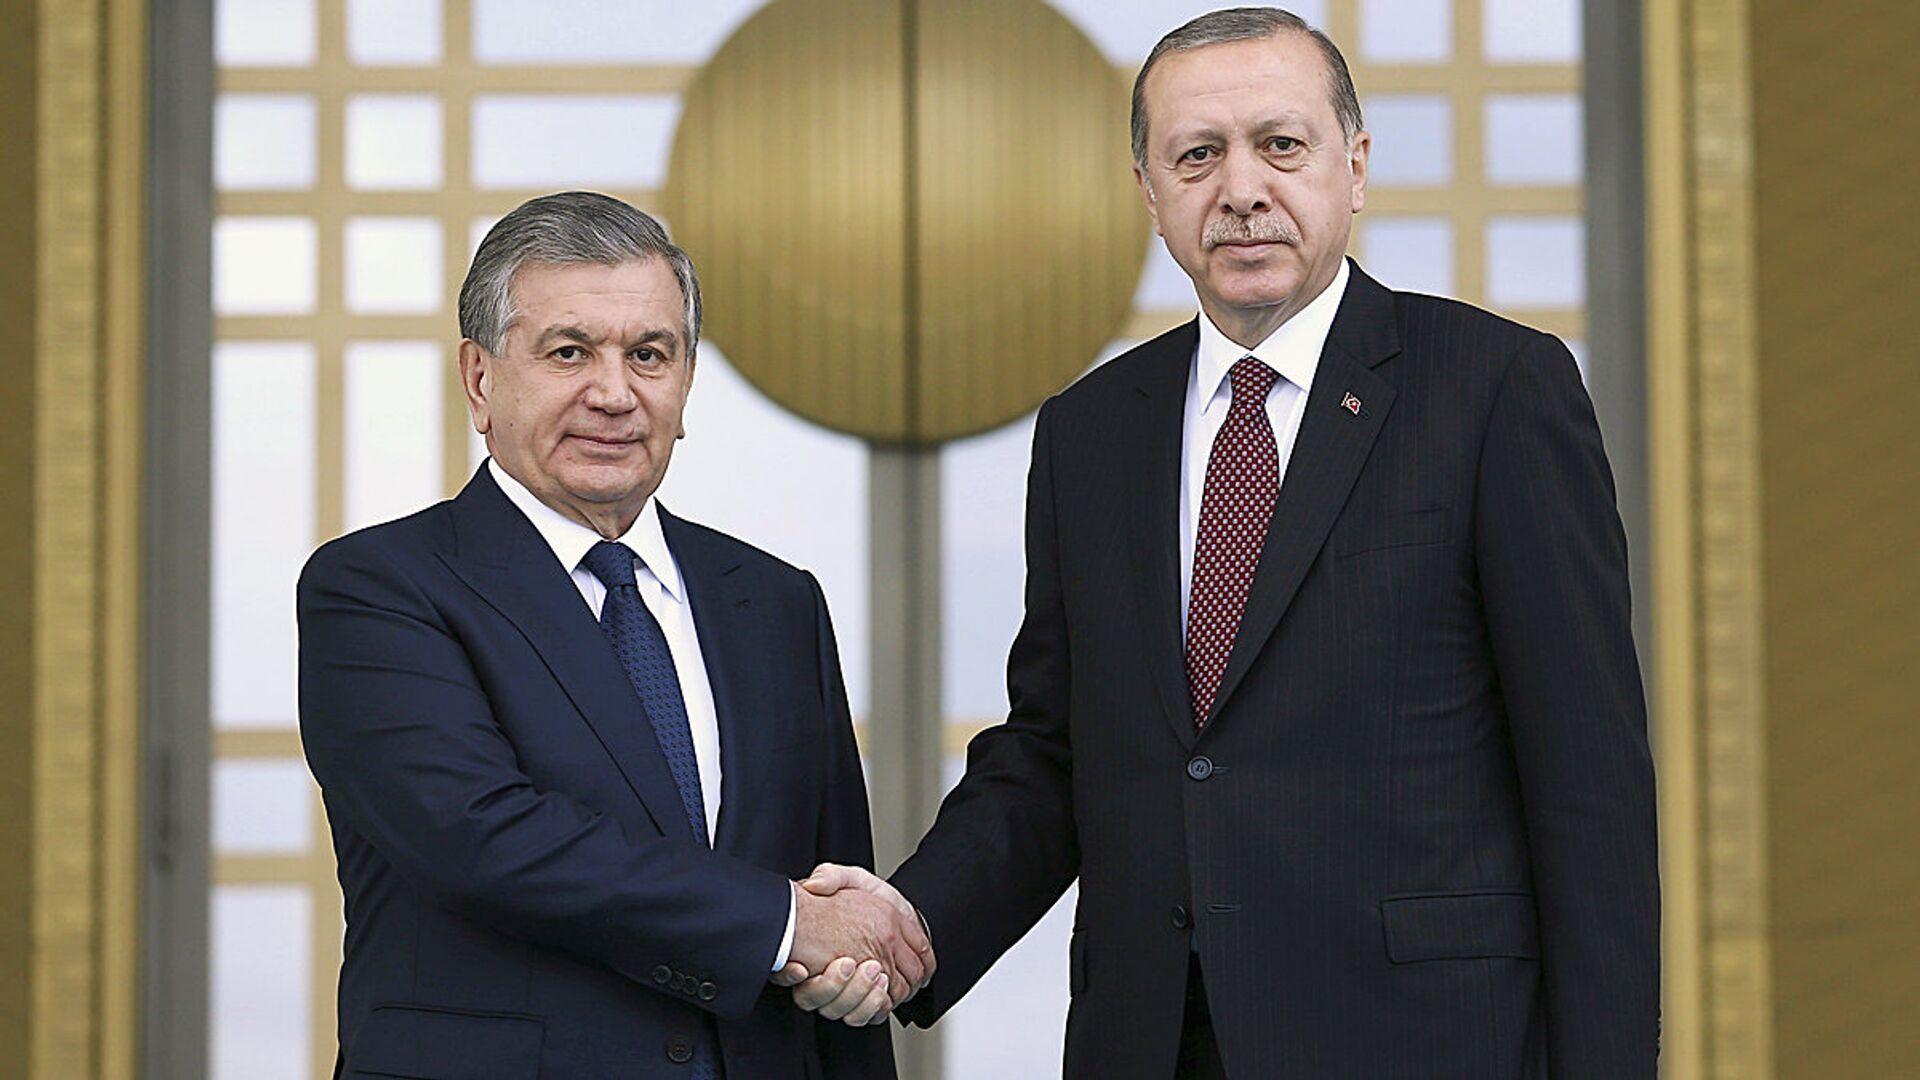 Президент Узбекистана Шавкат Мирзиёев и президент Турции Реджеп Тайип Эрдоган в Анкаре - Sputnik Узбекистан, 1920, 03.09.2021